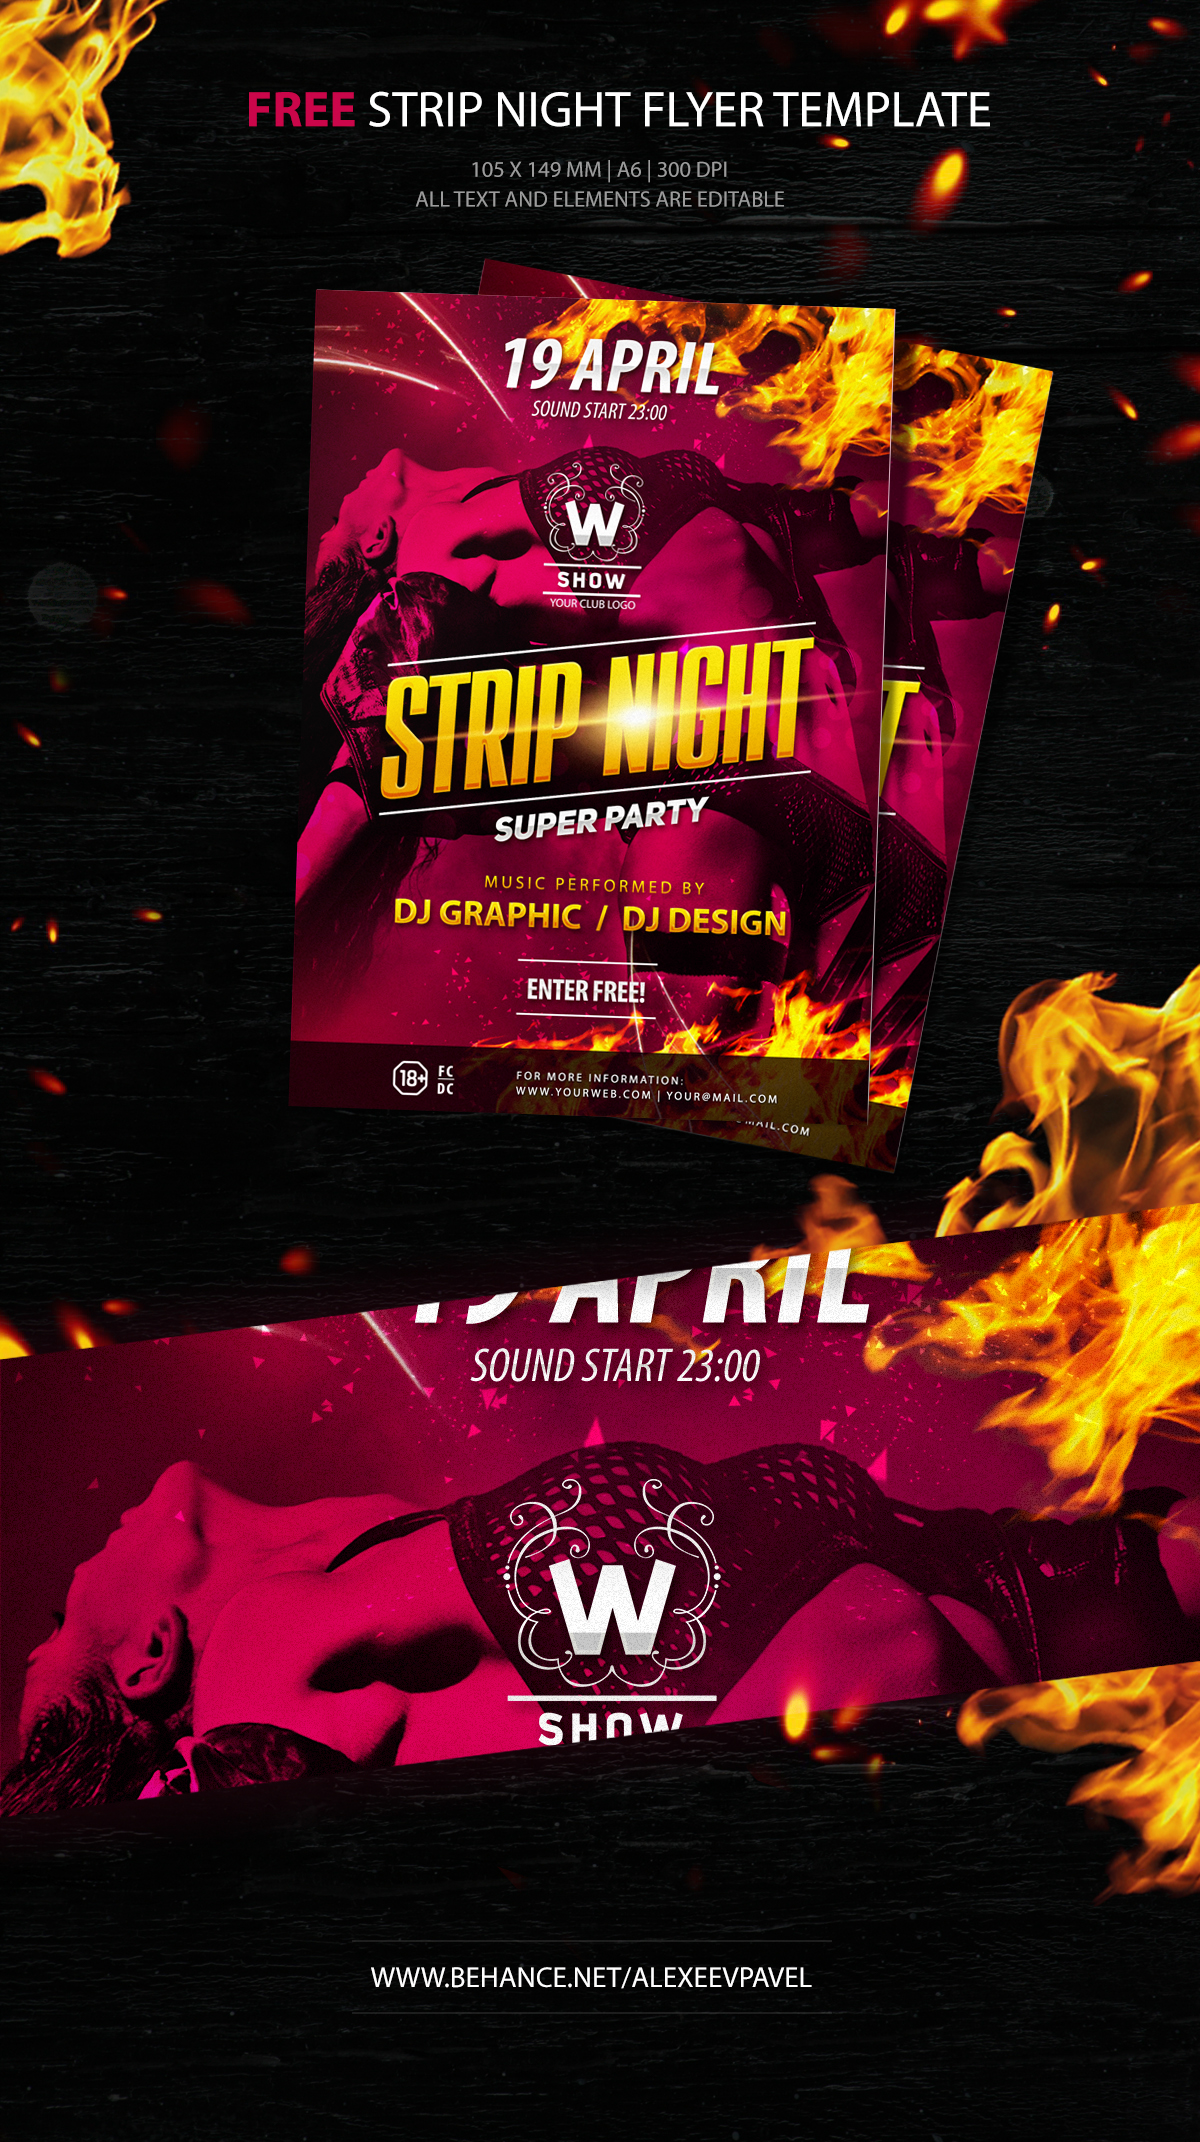 Strip night - free flyer template PSD